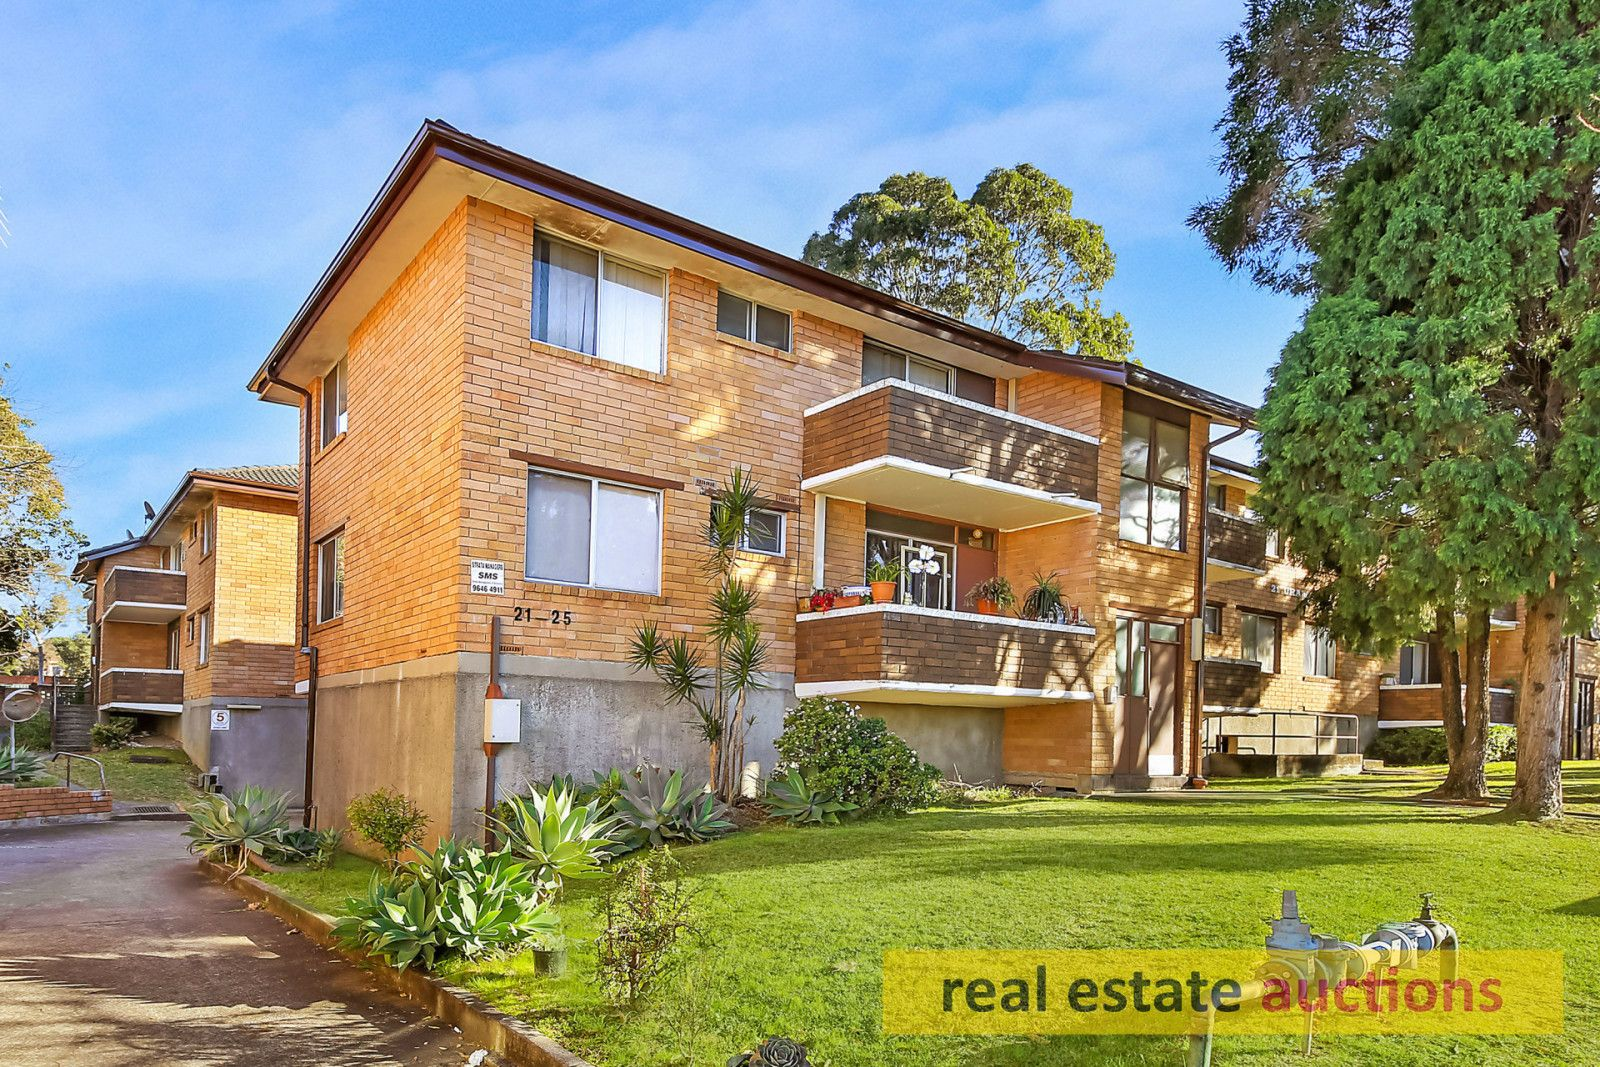 13/21 CRAWFORD STREET, Berala NSW 2141, Image 0